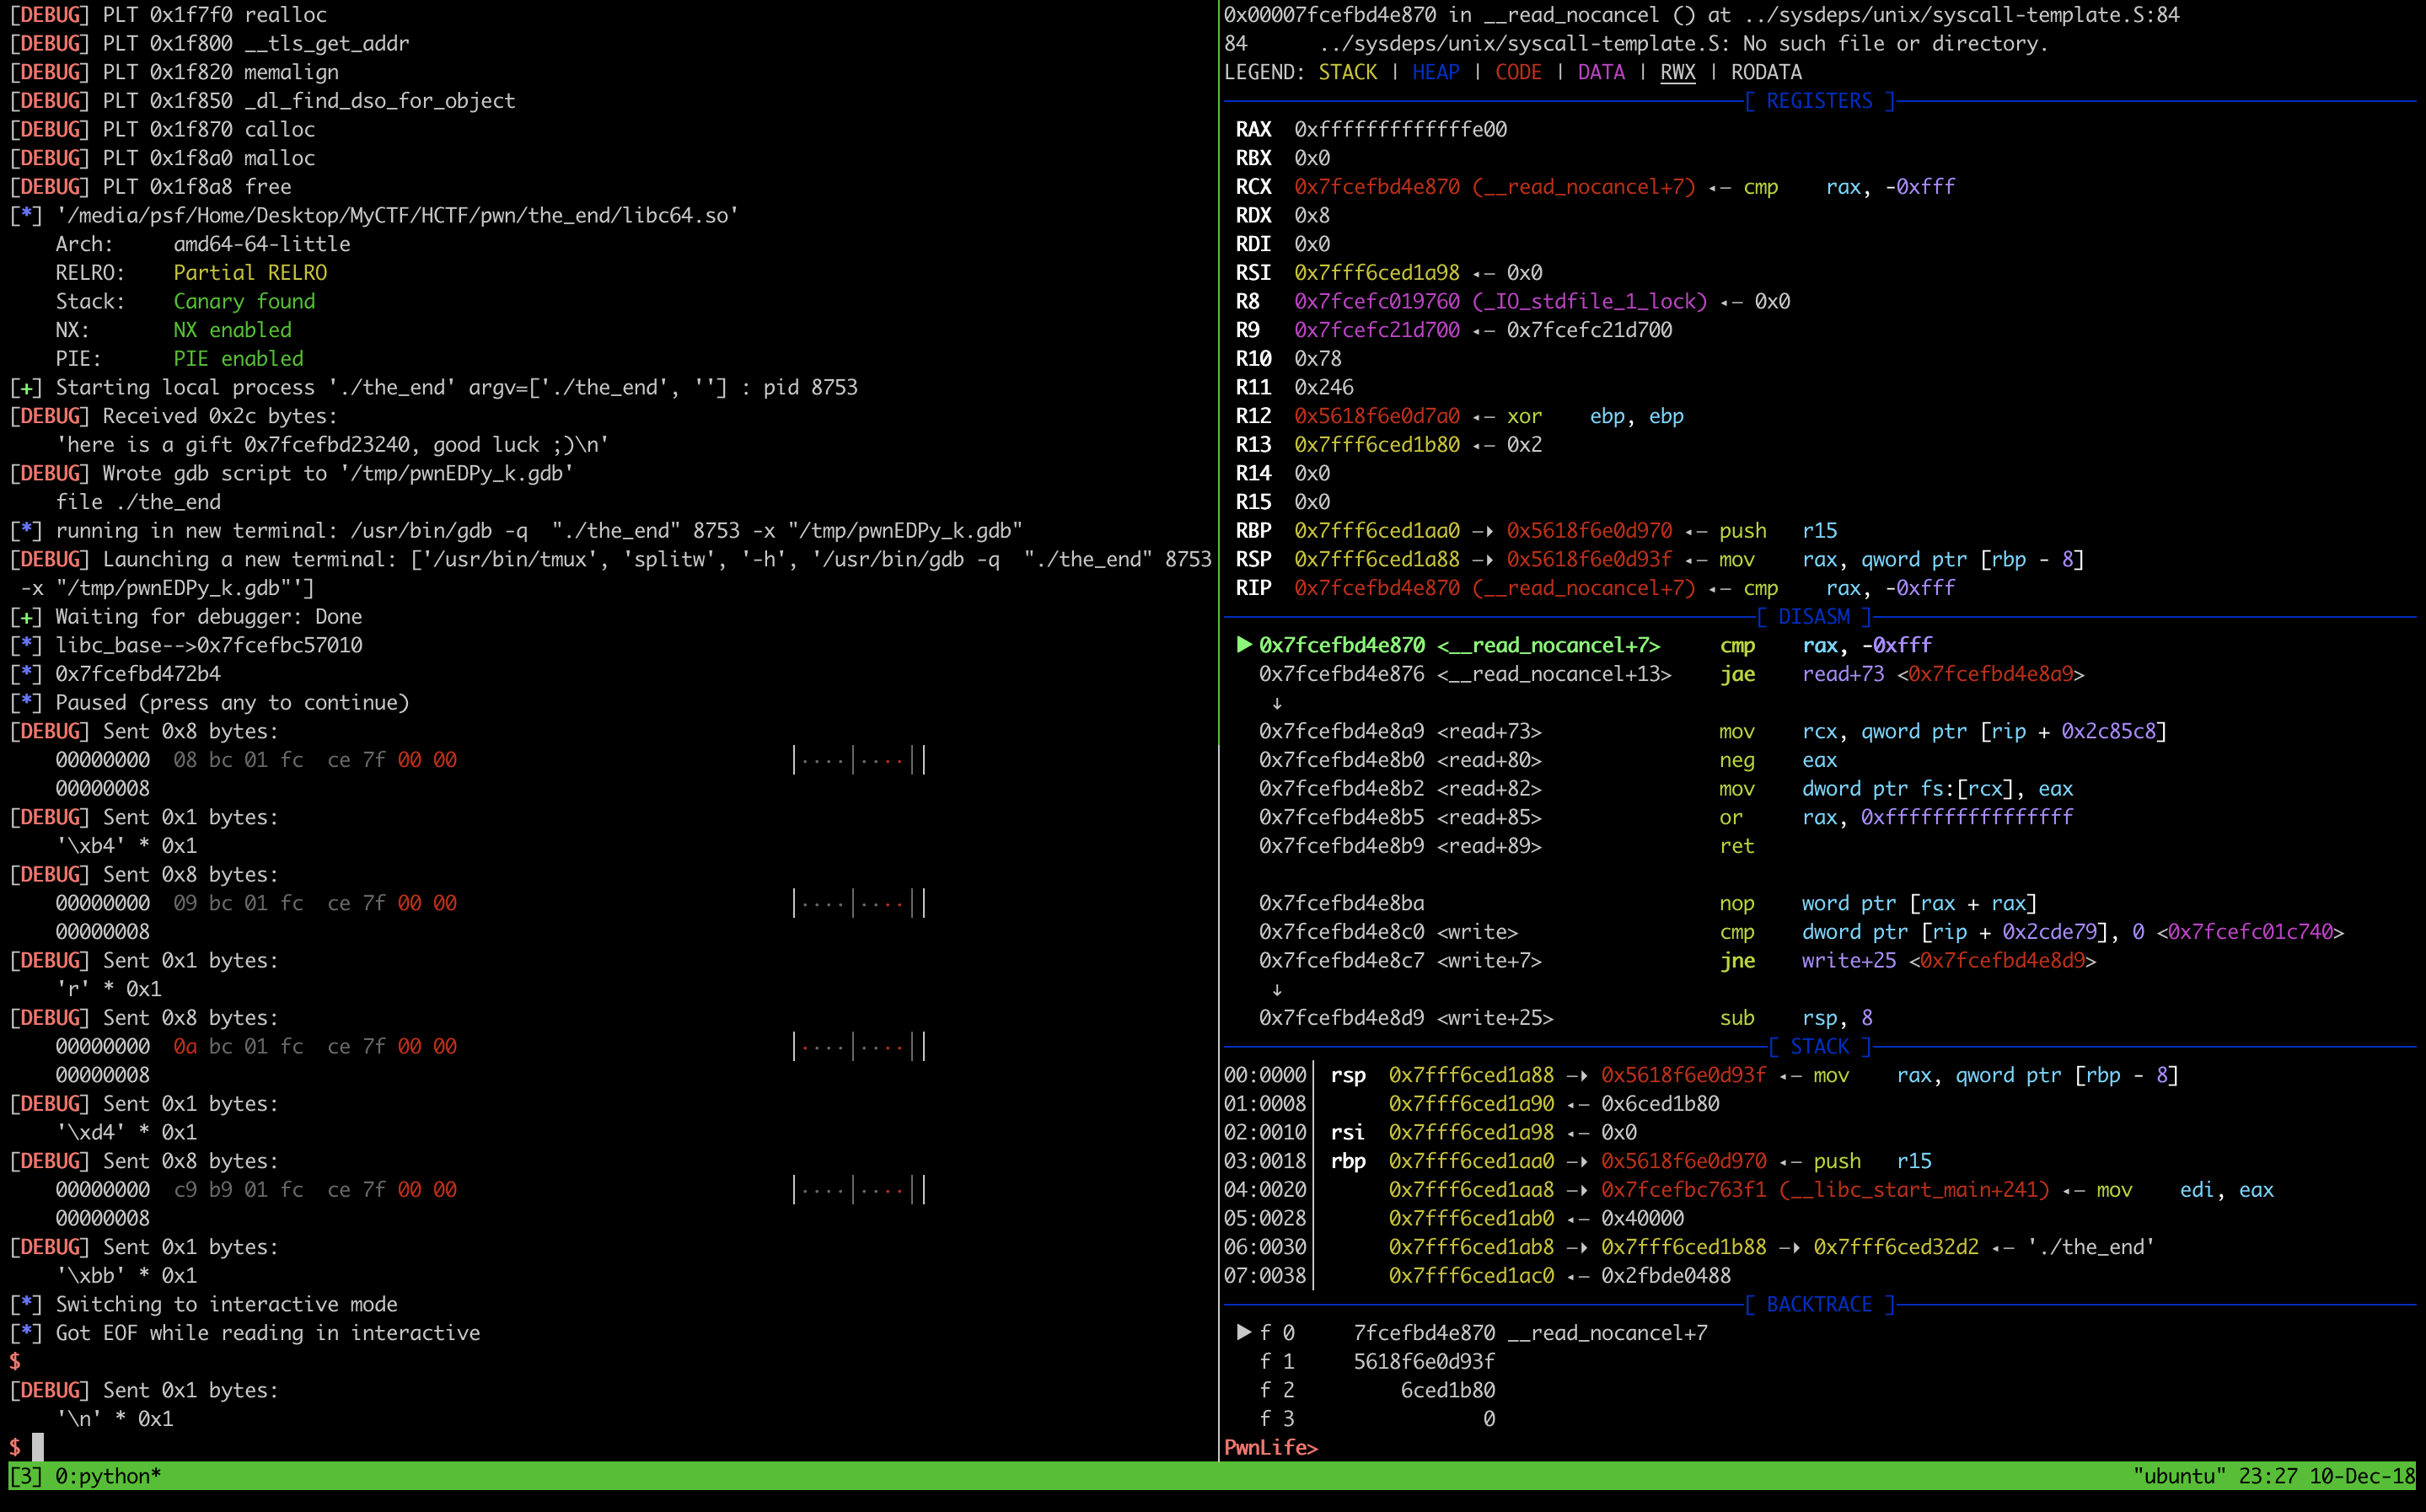 Docker for Mac and gdb GUI windows